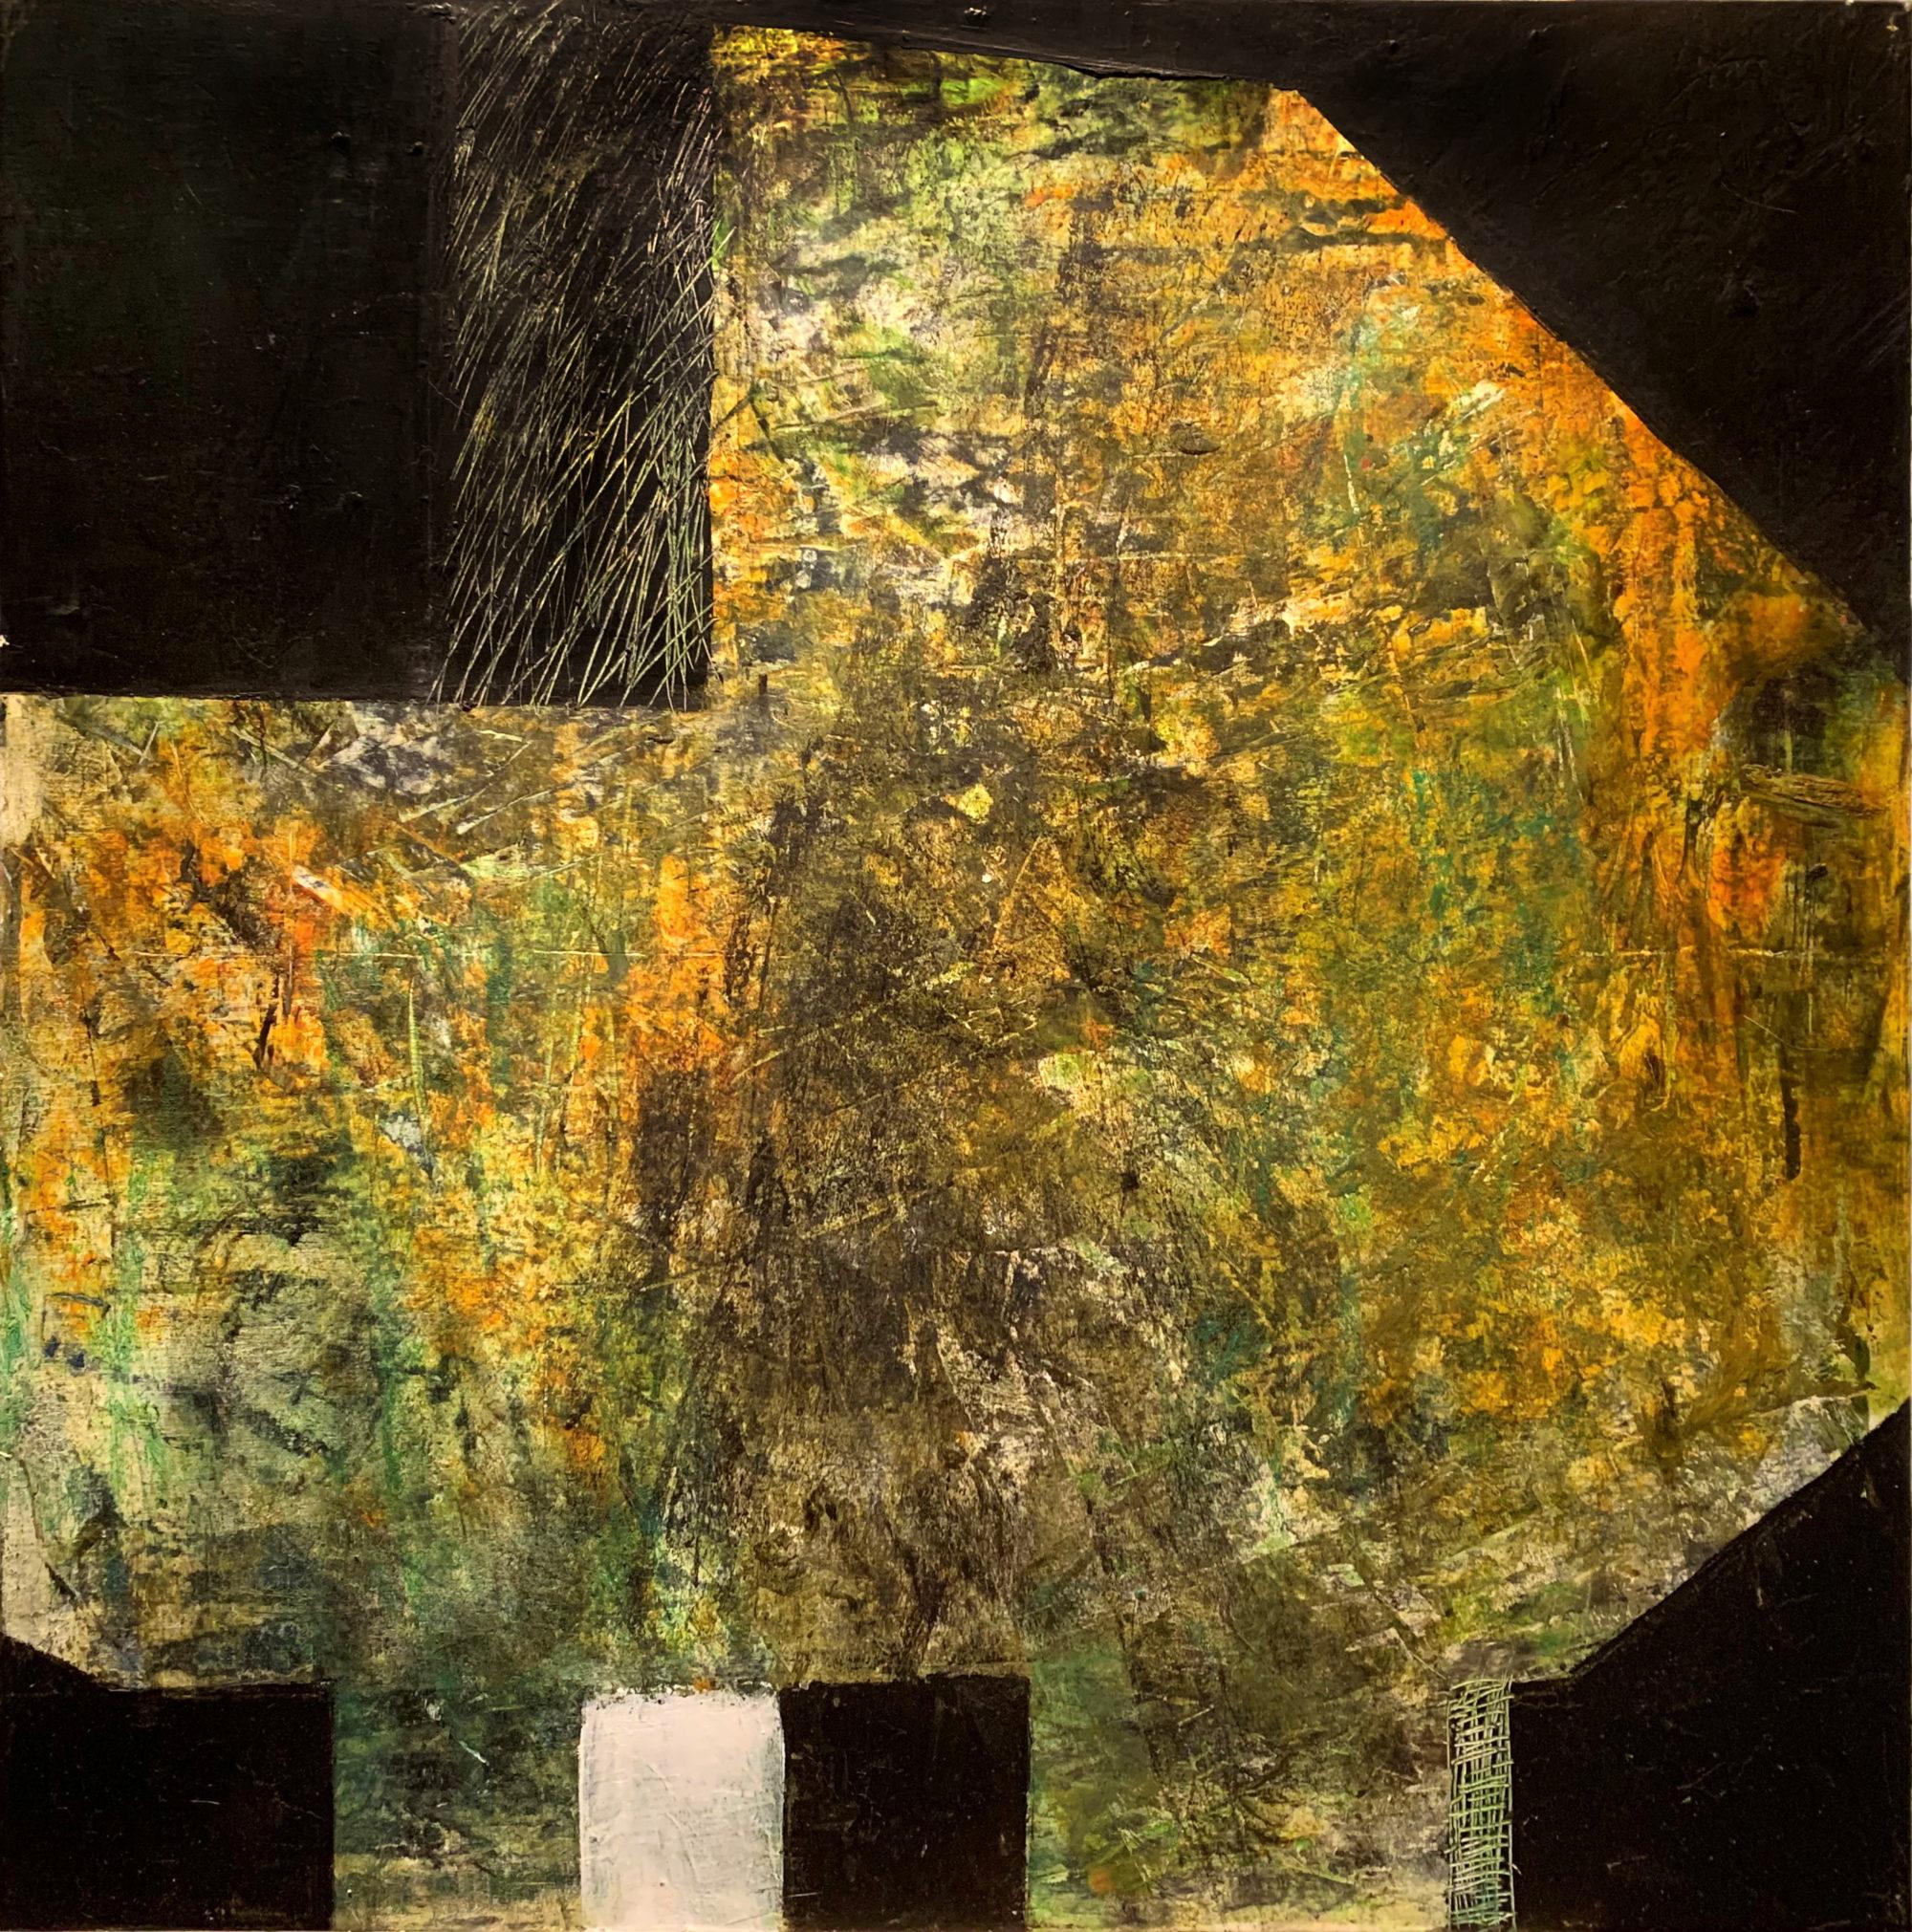 Etchings on Walls of Ninevah II 60 x 60 oil & cold wax